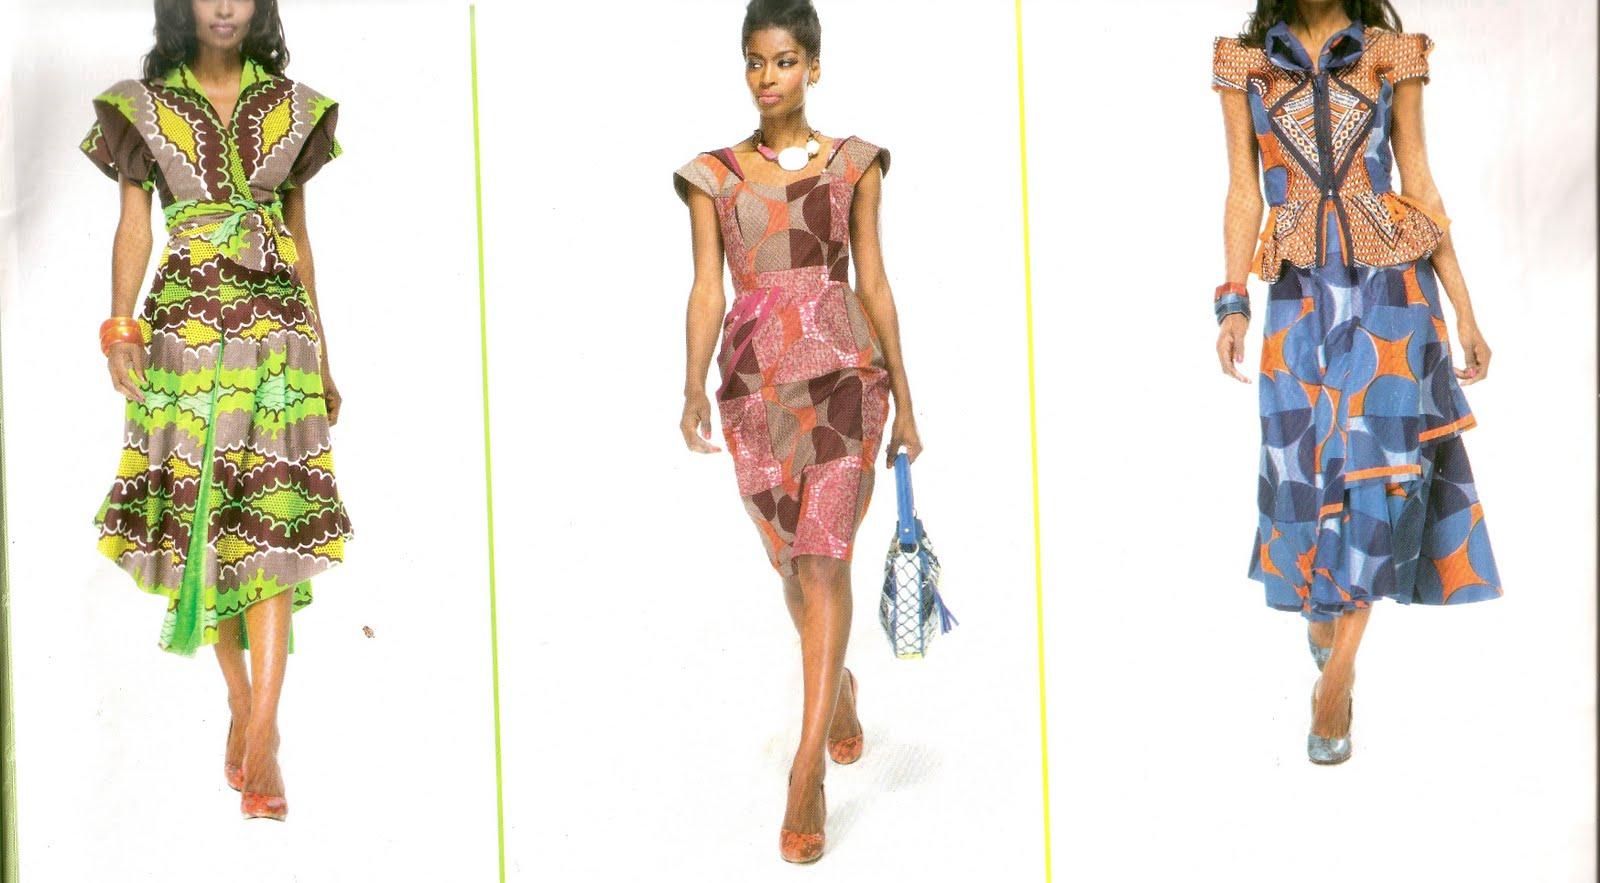 nigerian clothing for men nigerian clothing designs women nigerian ...